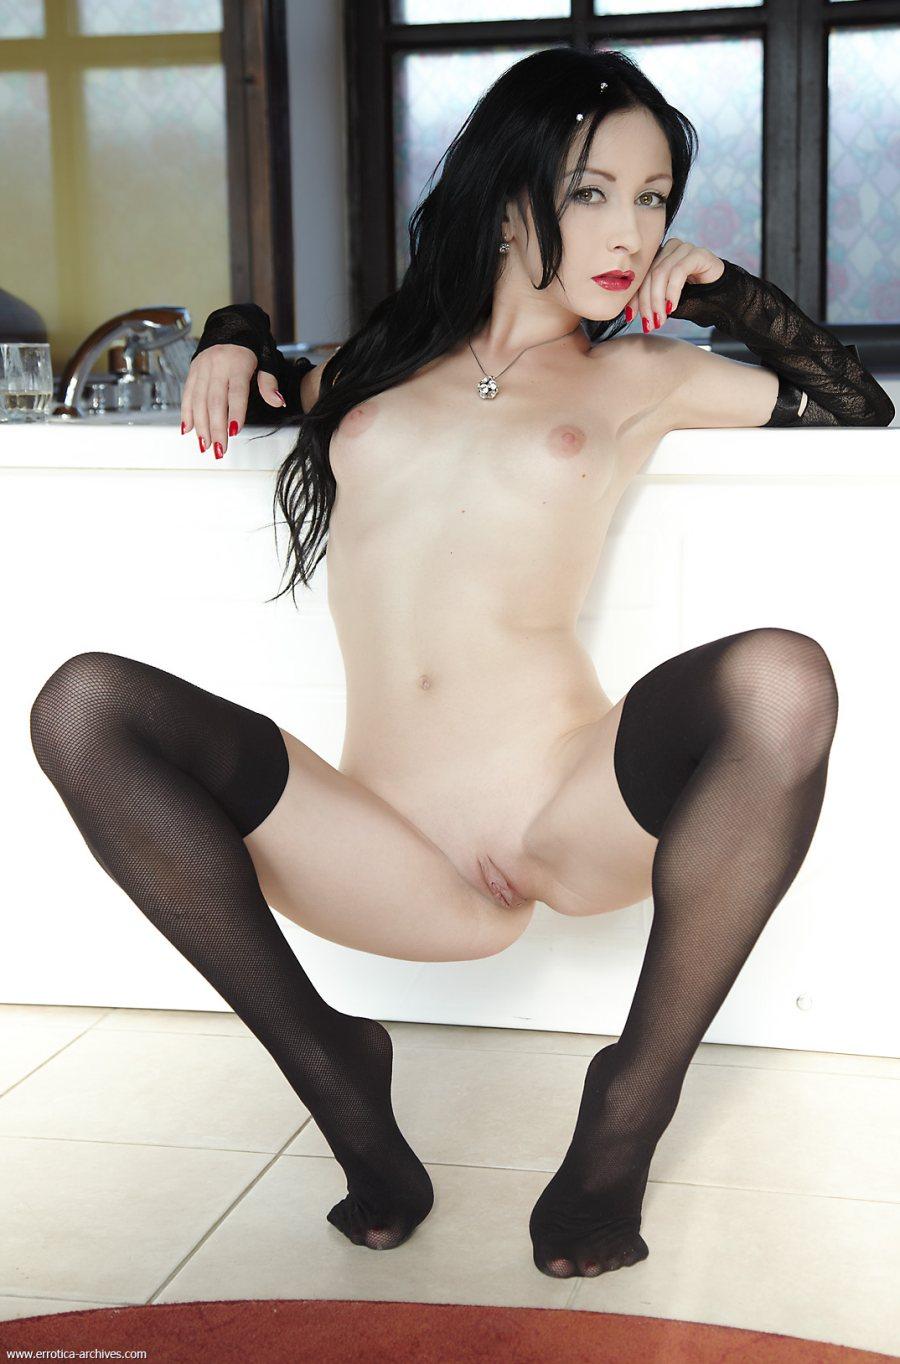 nude girls in black stockings